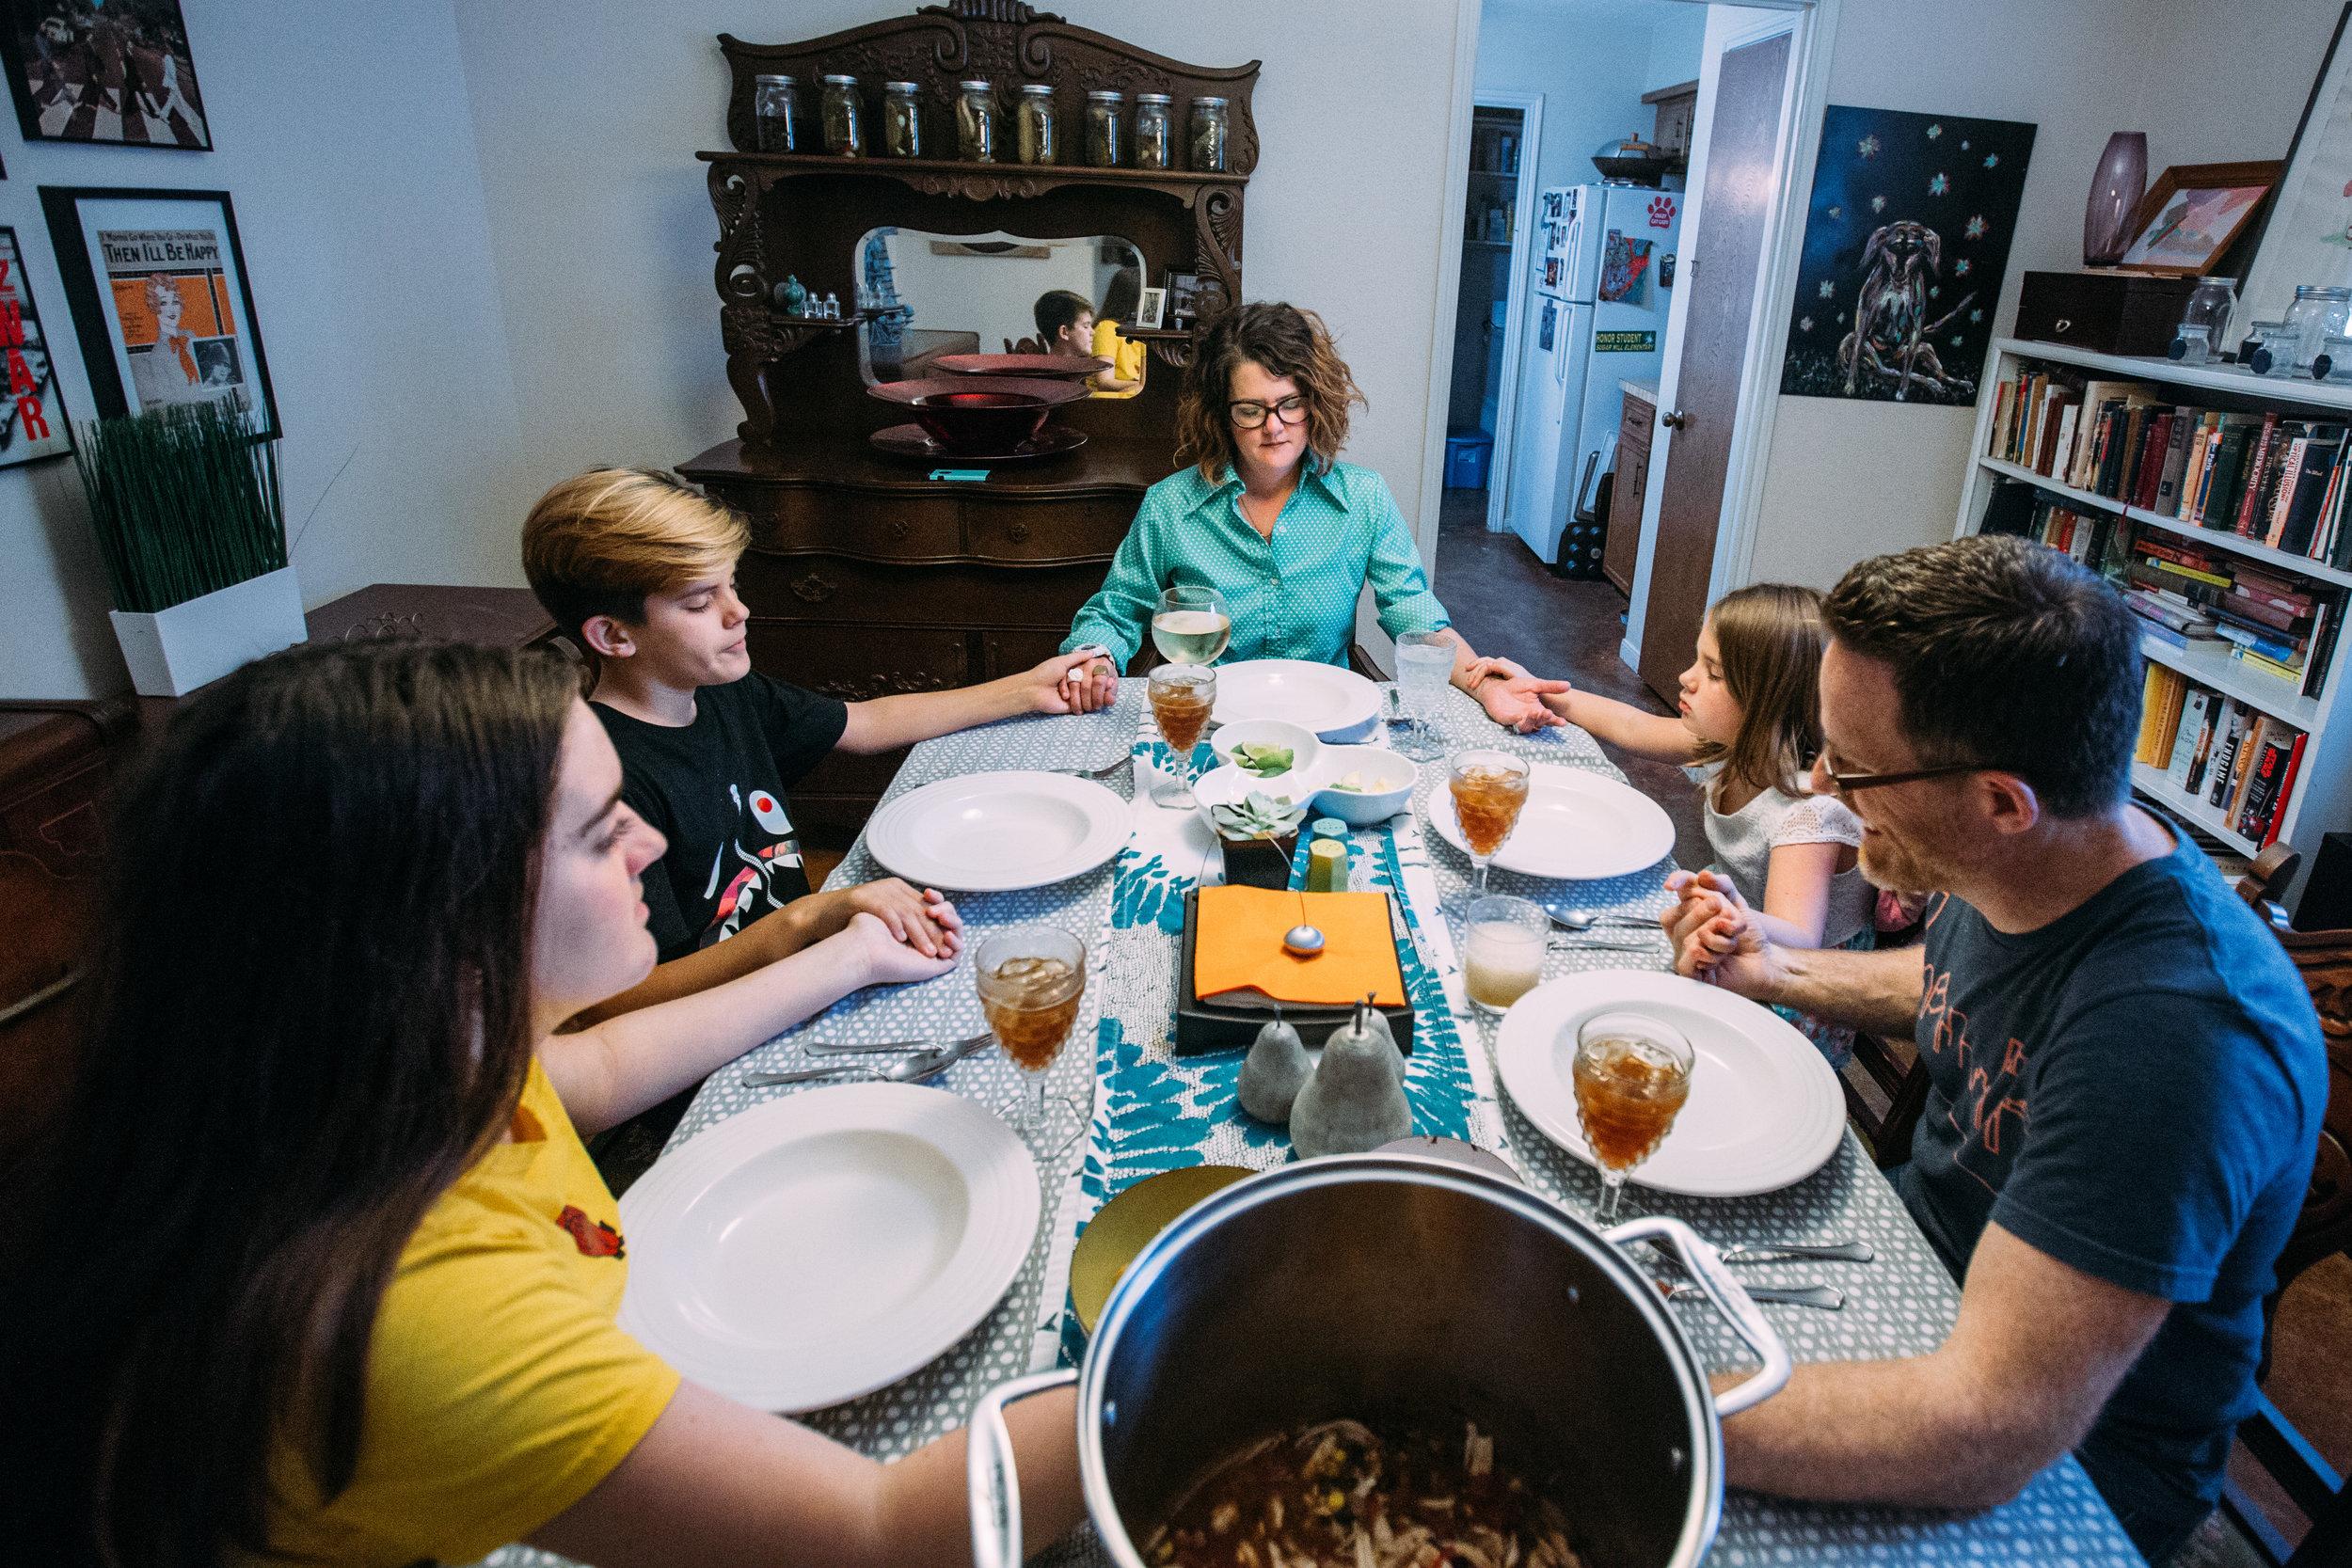 family-photographer-houston-miertschin-0146.jpg